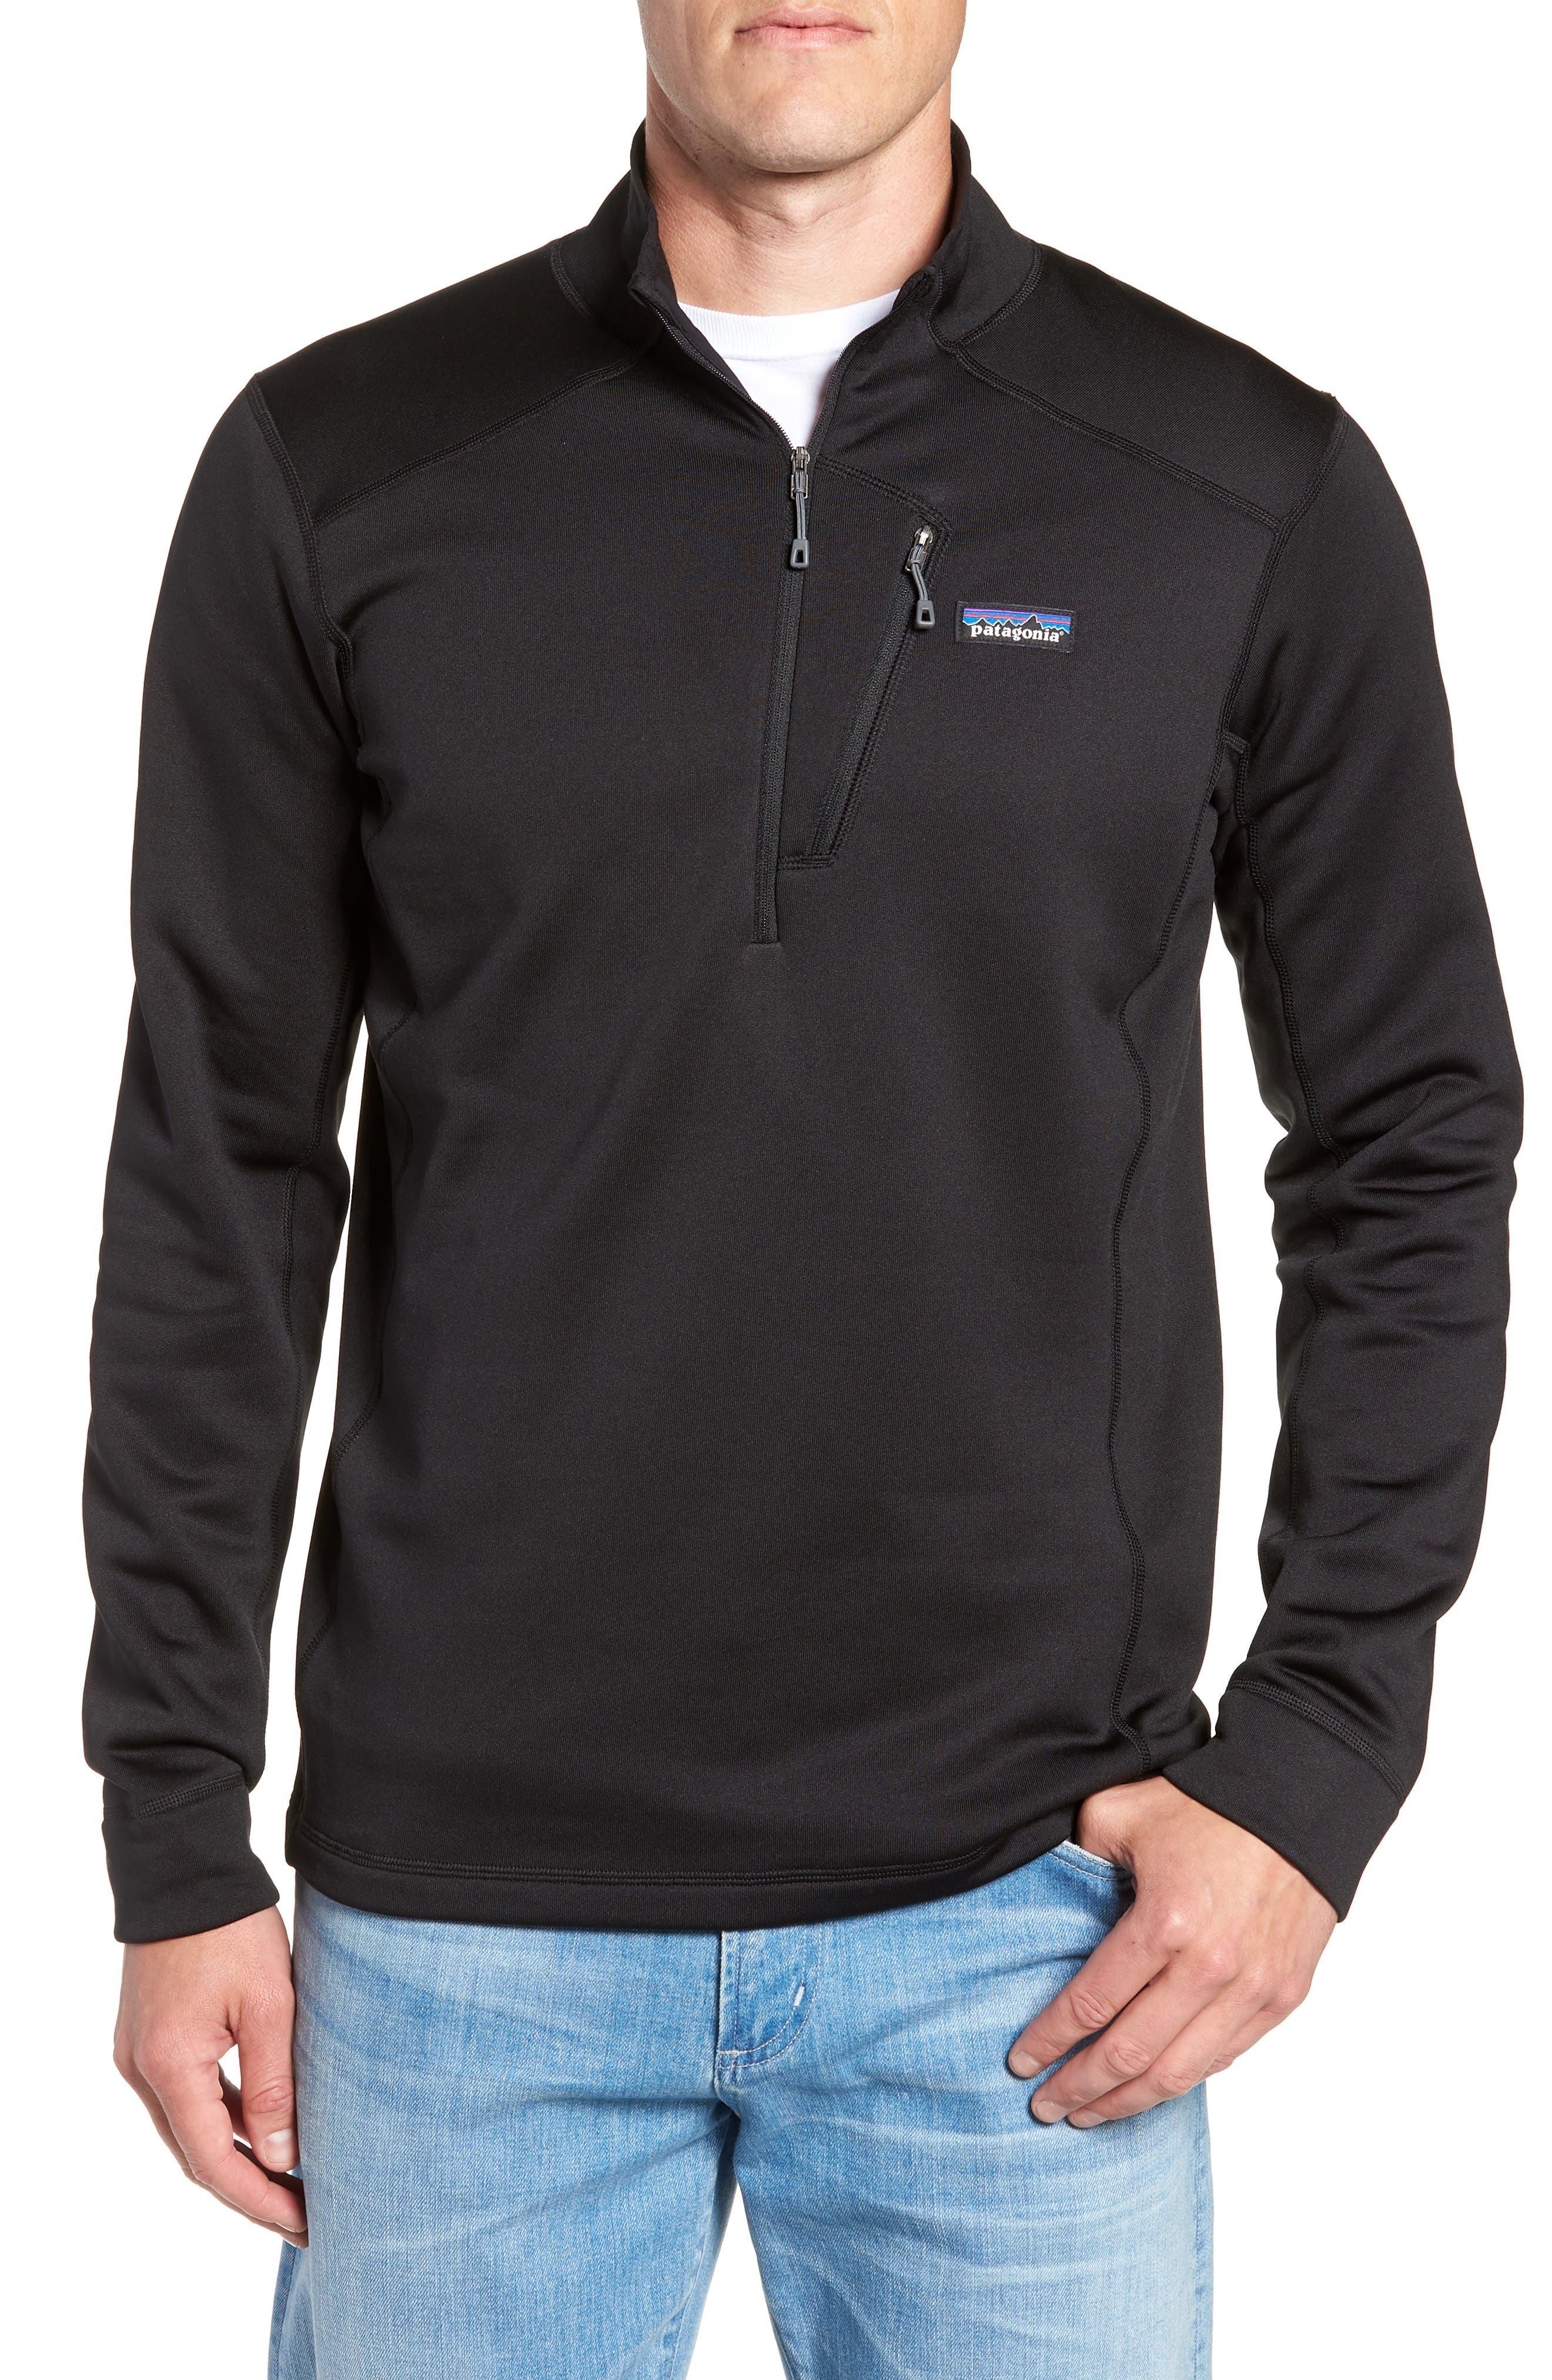 Crosstrek Quarter Zip Fleece Pullover,                             Main thumbnail 1, color,                             BLACK